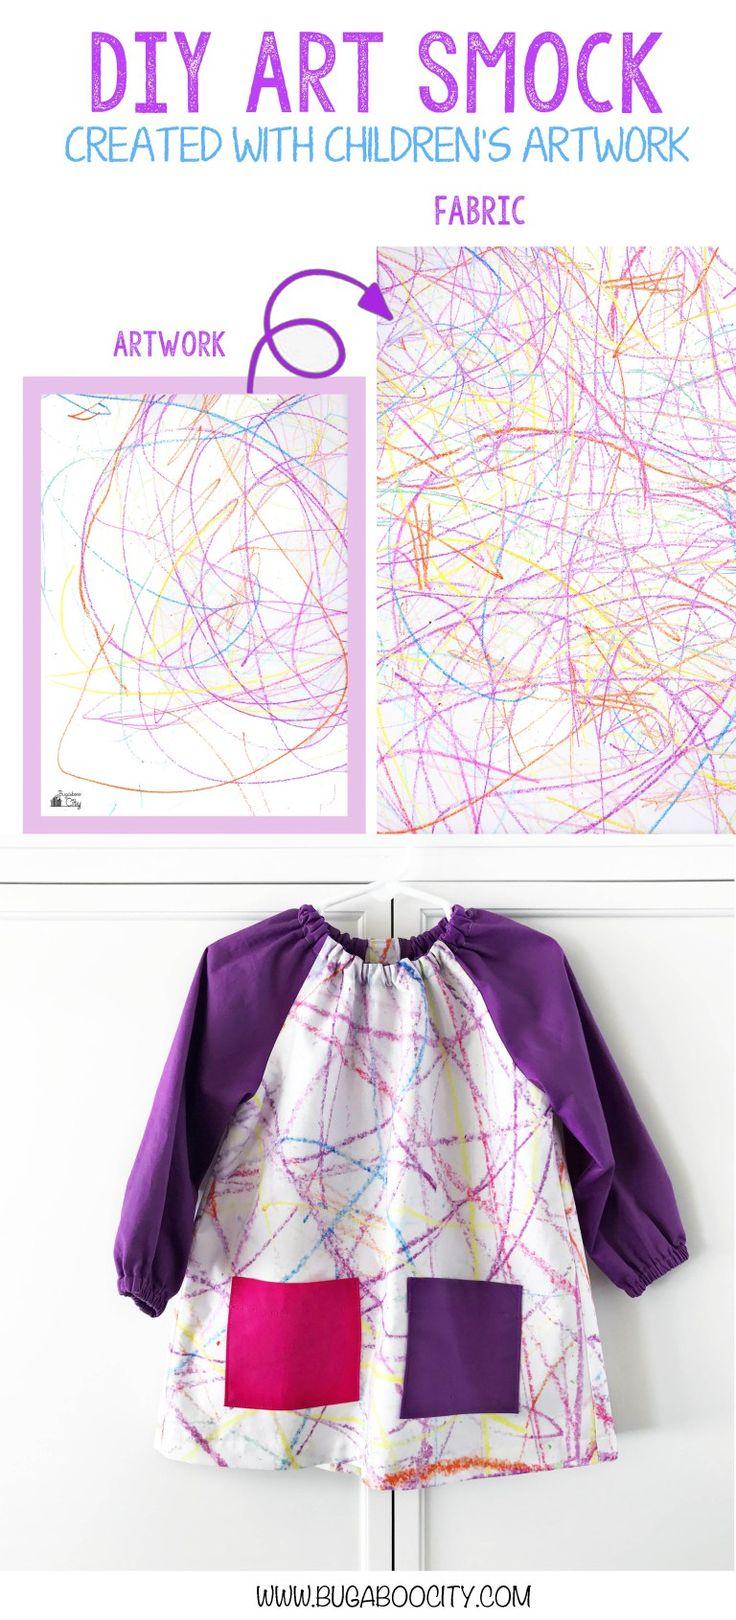 White apron sergio vodanovic english - Diy Art Smock Created With Kid S Artwork